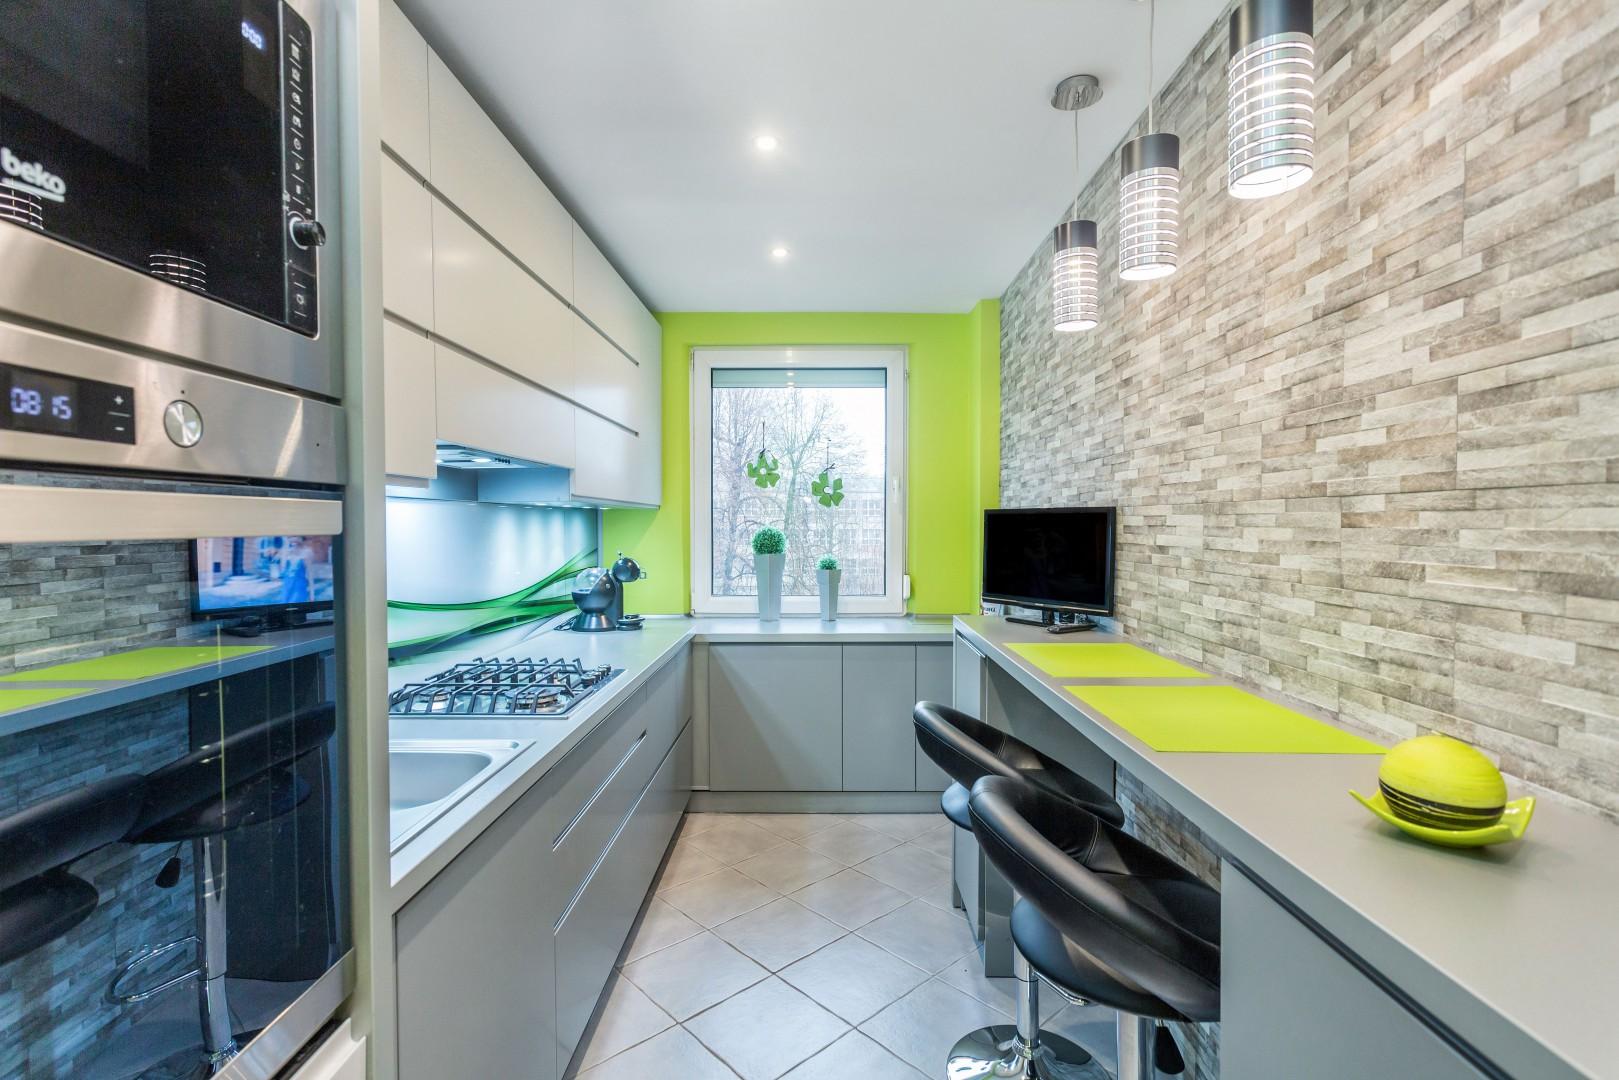 Studio Max Kuchnie Bugla